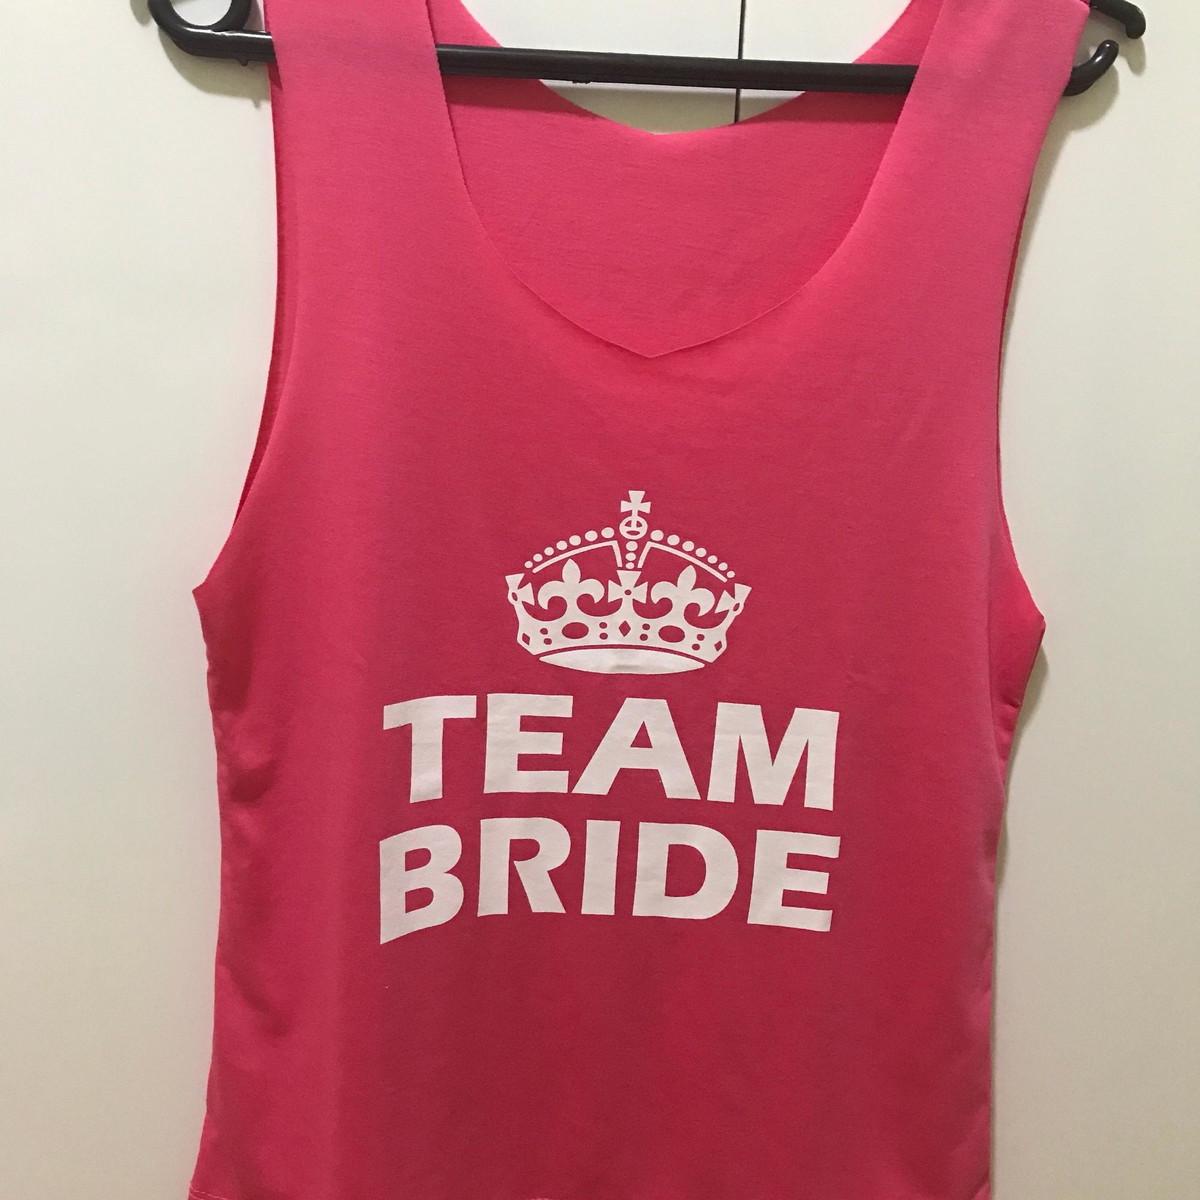 03fbbd35a Camiseta Despedida Solteira Team Bride Regata no Elo7